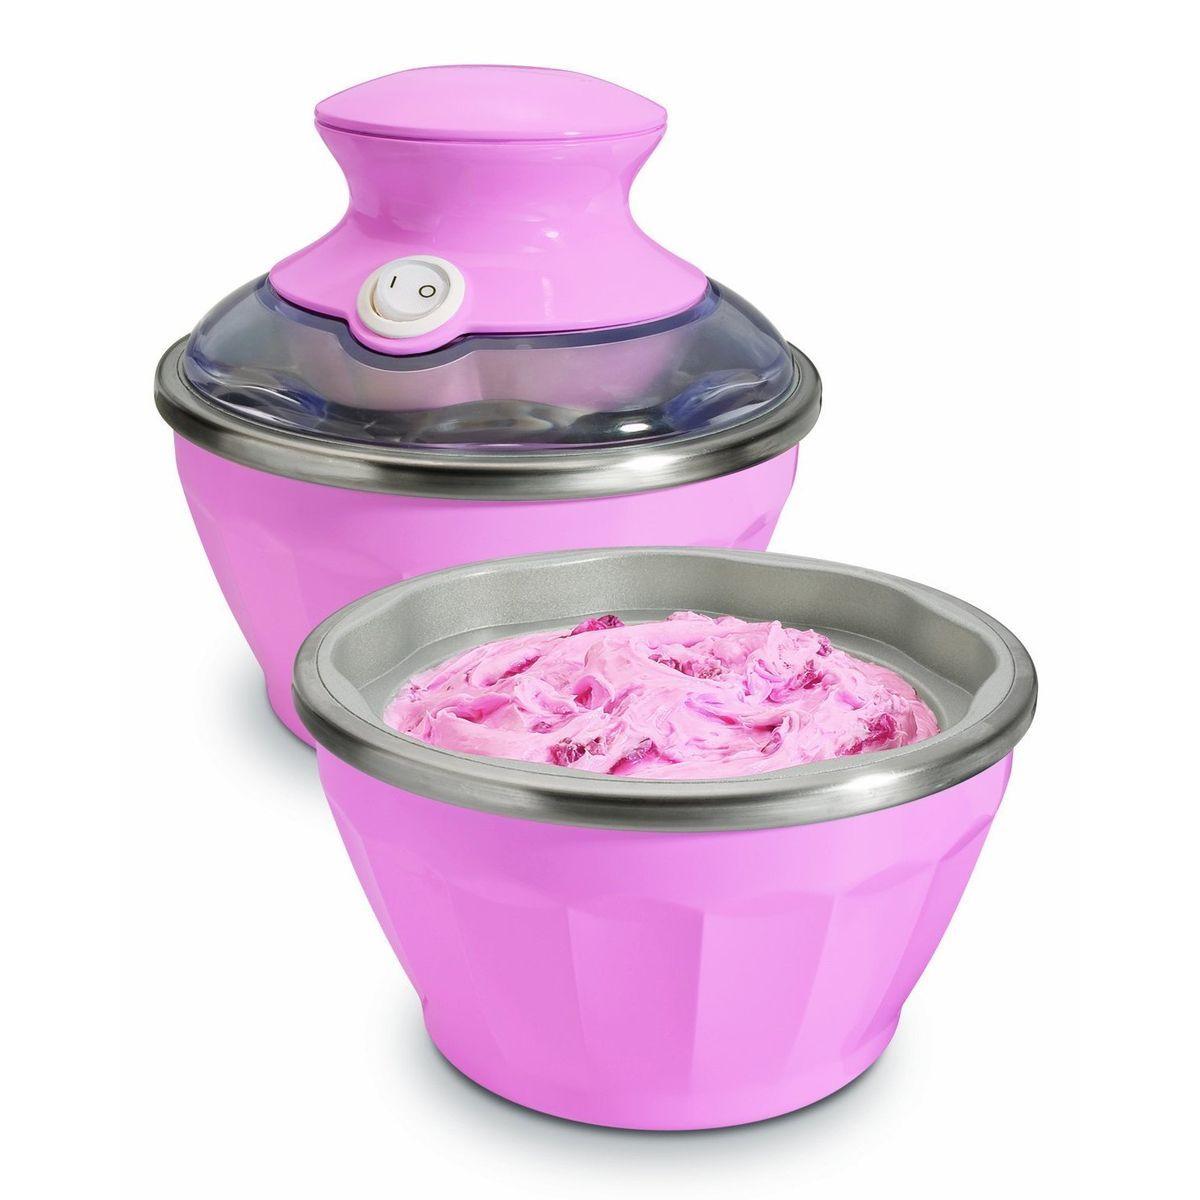 Half Pint Soft Serve Ice Cream Maker in Pink 68550E New in Box